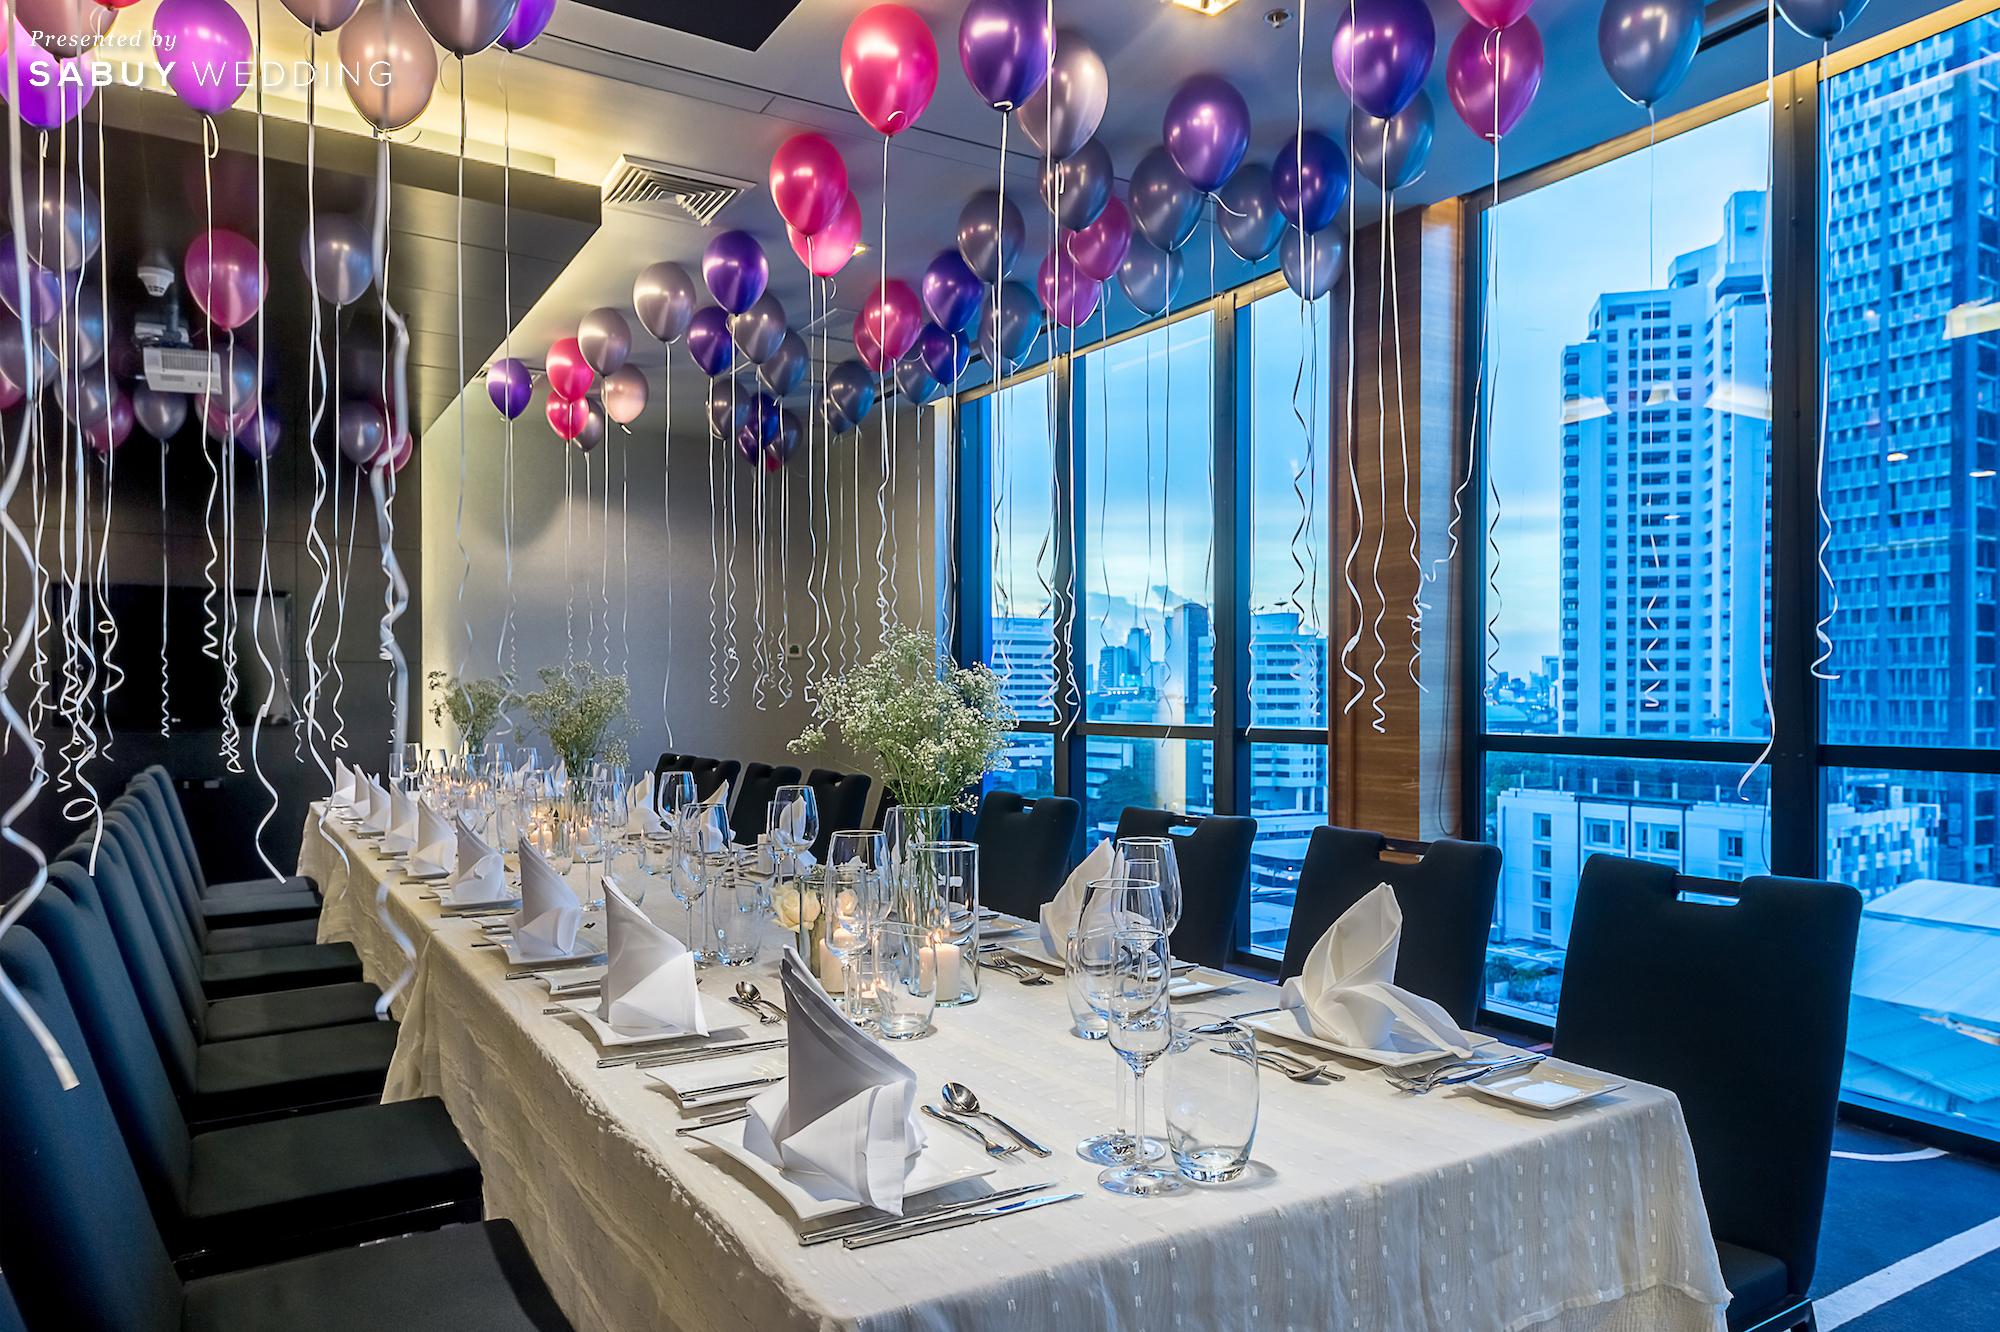 ALOFT BANGKOK-SUKHUMVIT 11,Marriott Wedding Thailand,แมริออท ประเทศไทย,สถานที่แต่งงาน,สถานที่จัดงานแต่งงาน,โรงแรม,งานแต่งงาน,งานเลี้ยง ครบทุกความต้องการของบ่าวสาว กับ 40 สถานที่แต่งงานในเครือ Marriott